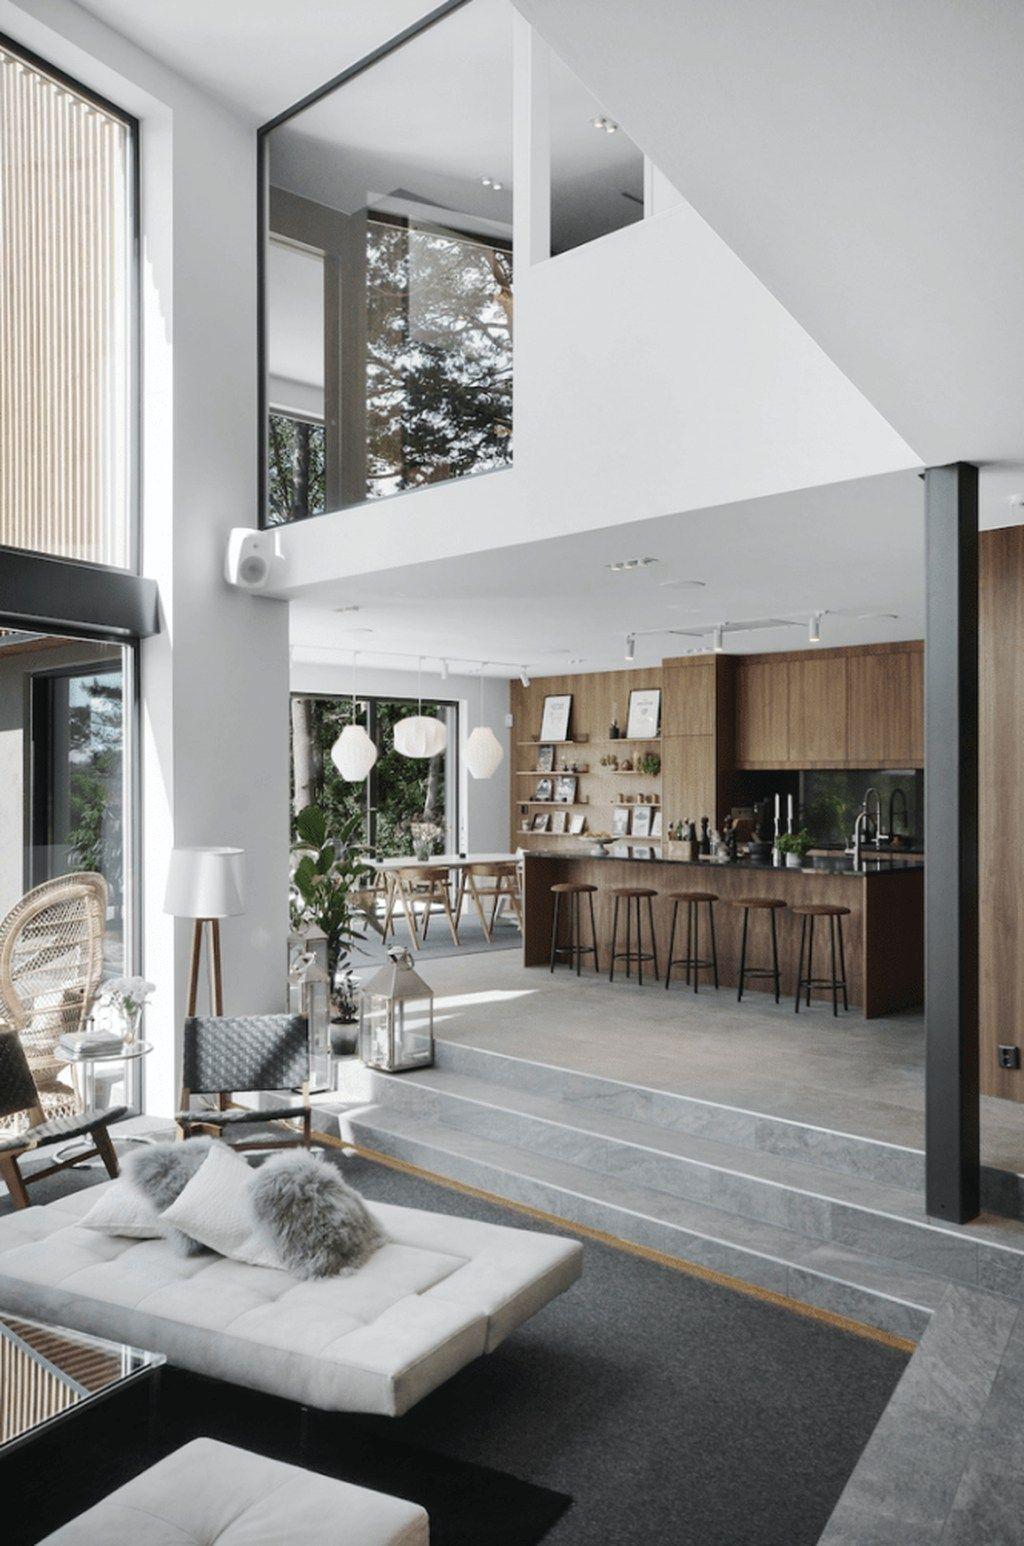 Simple Contemporary Home Decor Ideas 30 Modern Houses Interior